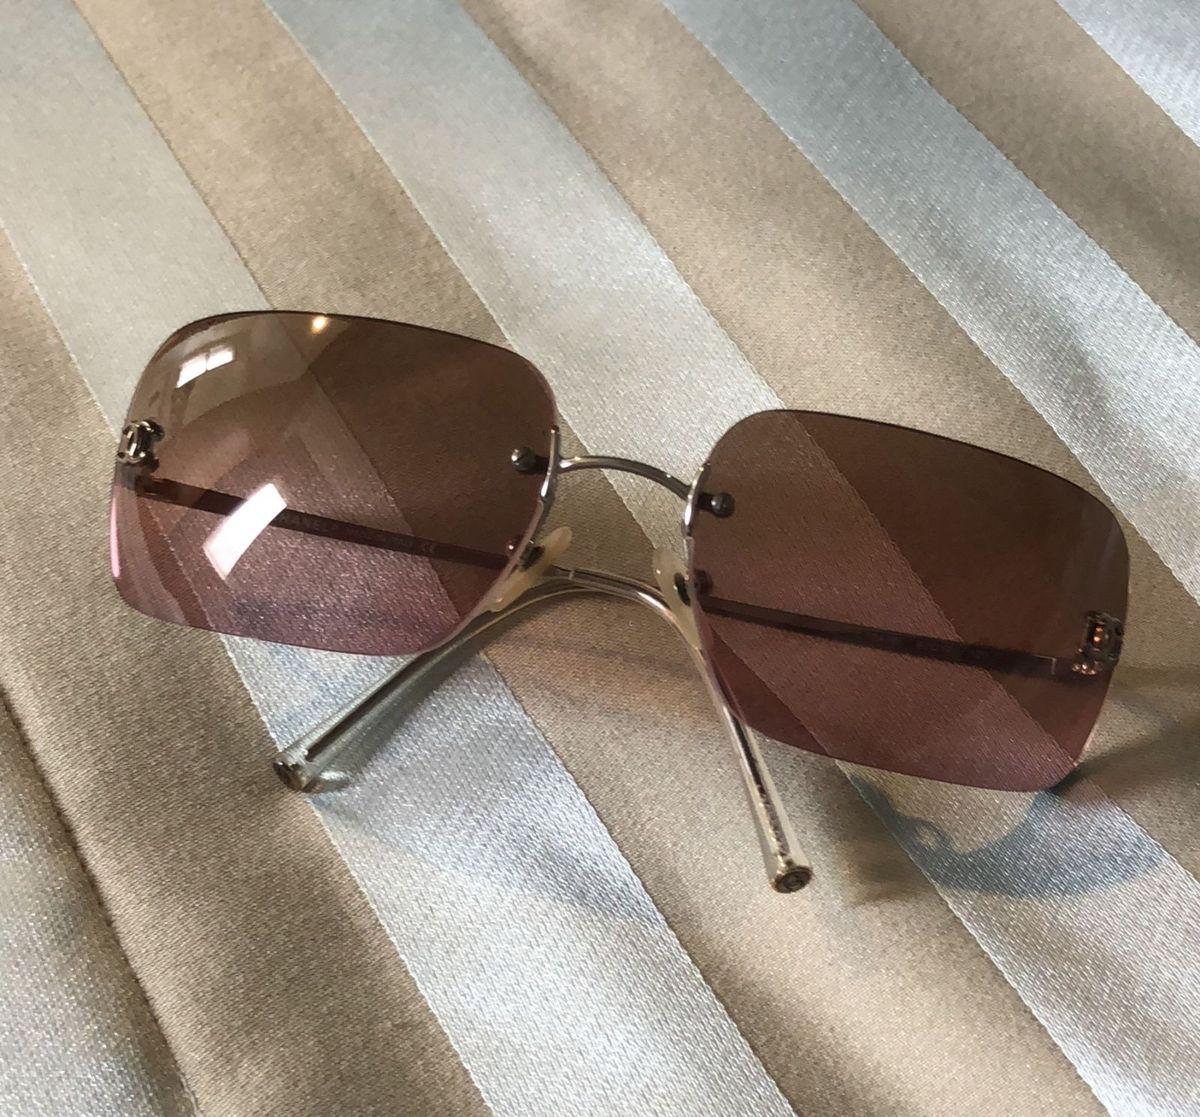 f190f8c4cdf93 Oculos Chanel Lente Degradê Transparente   Óculos Feminino Chanel ...